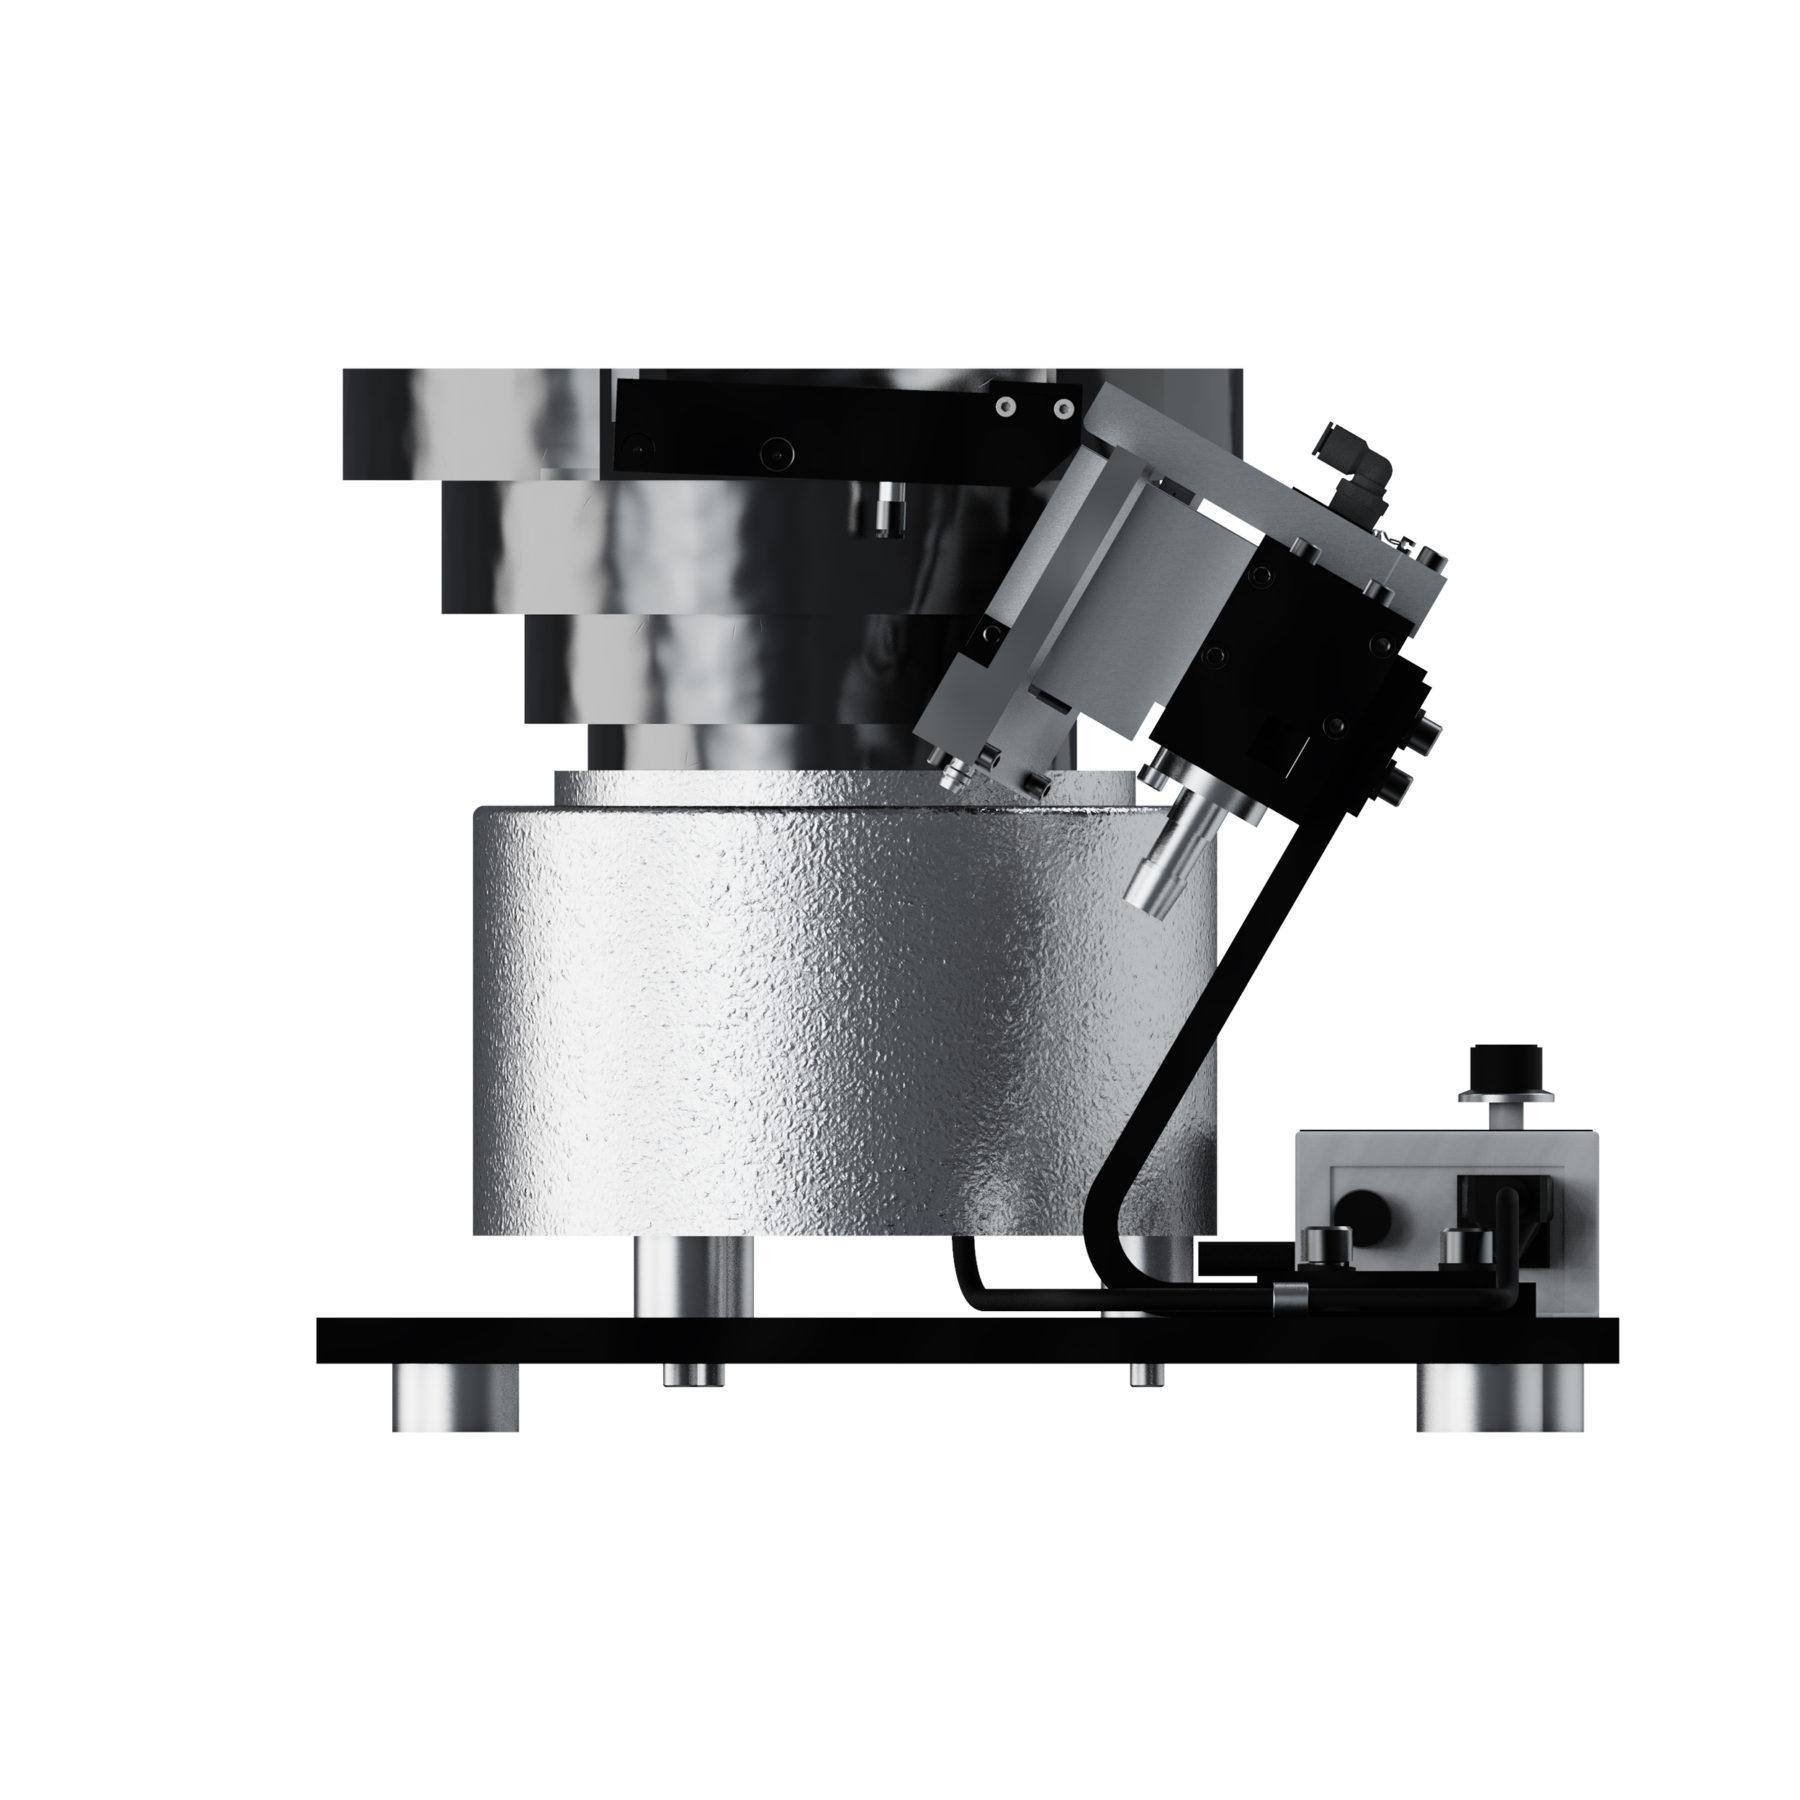 A10 Vibratory Bowl Screw Feeder Carlson Engineering Side 4